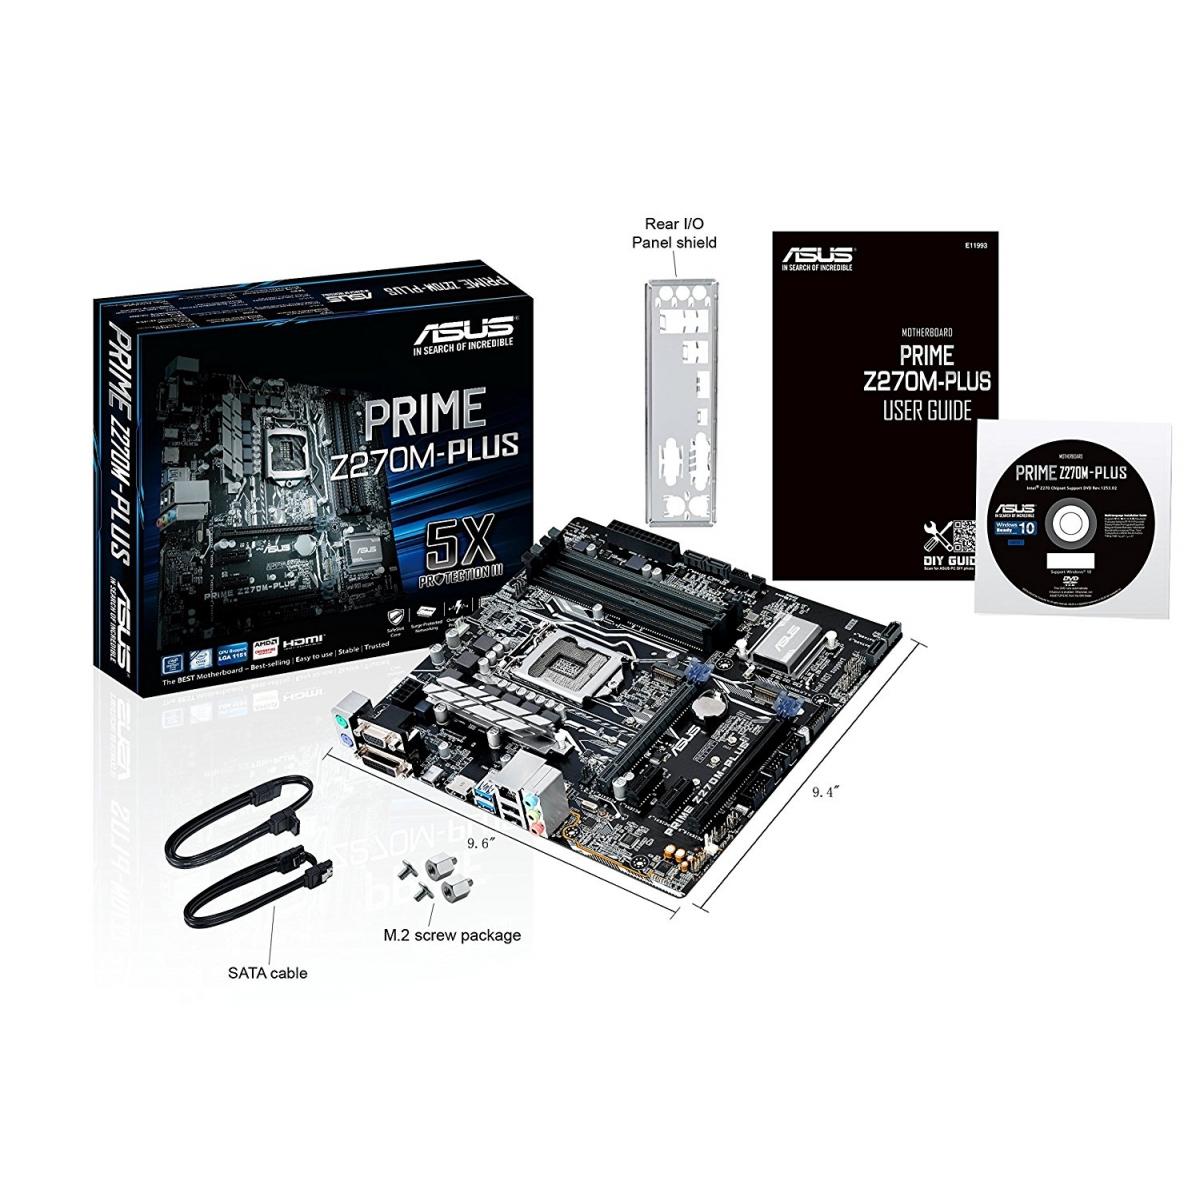 Placa Mãe Asus Prime Z270M-PLUS/BR, Chipset Z270, Intel LGA 1151, mATX, DDR4